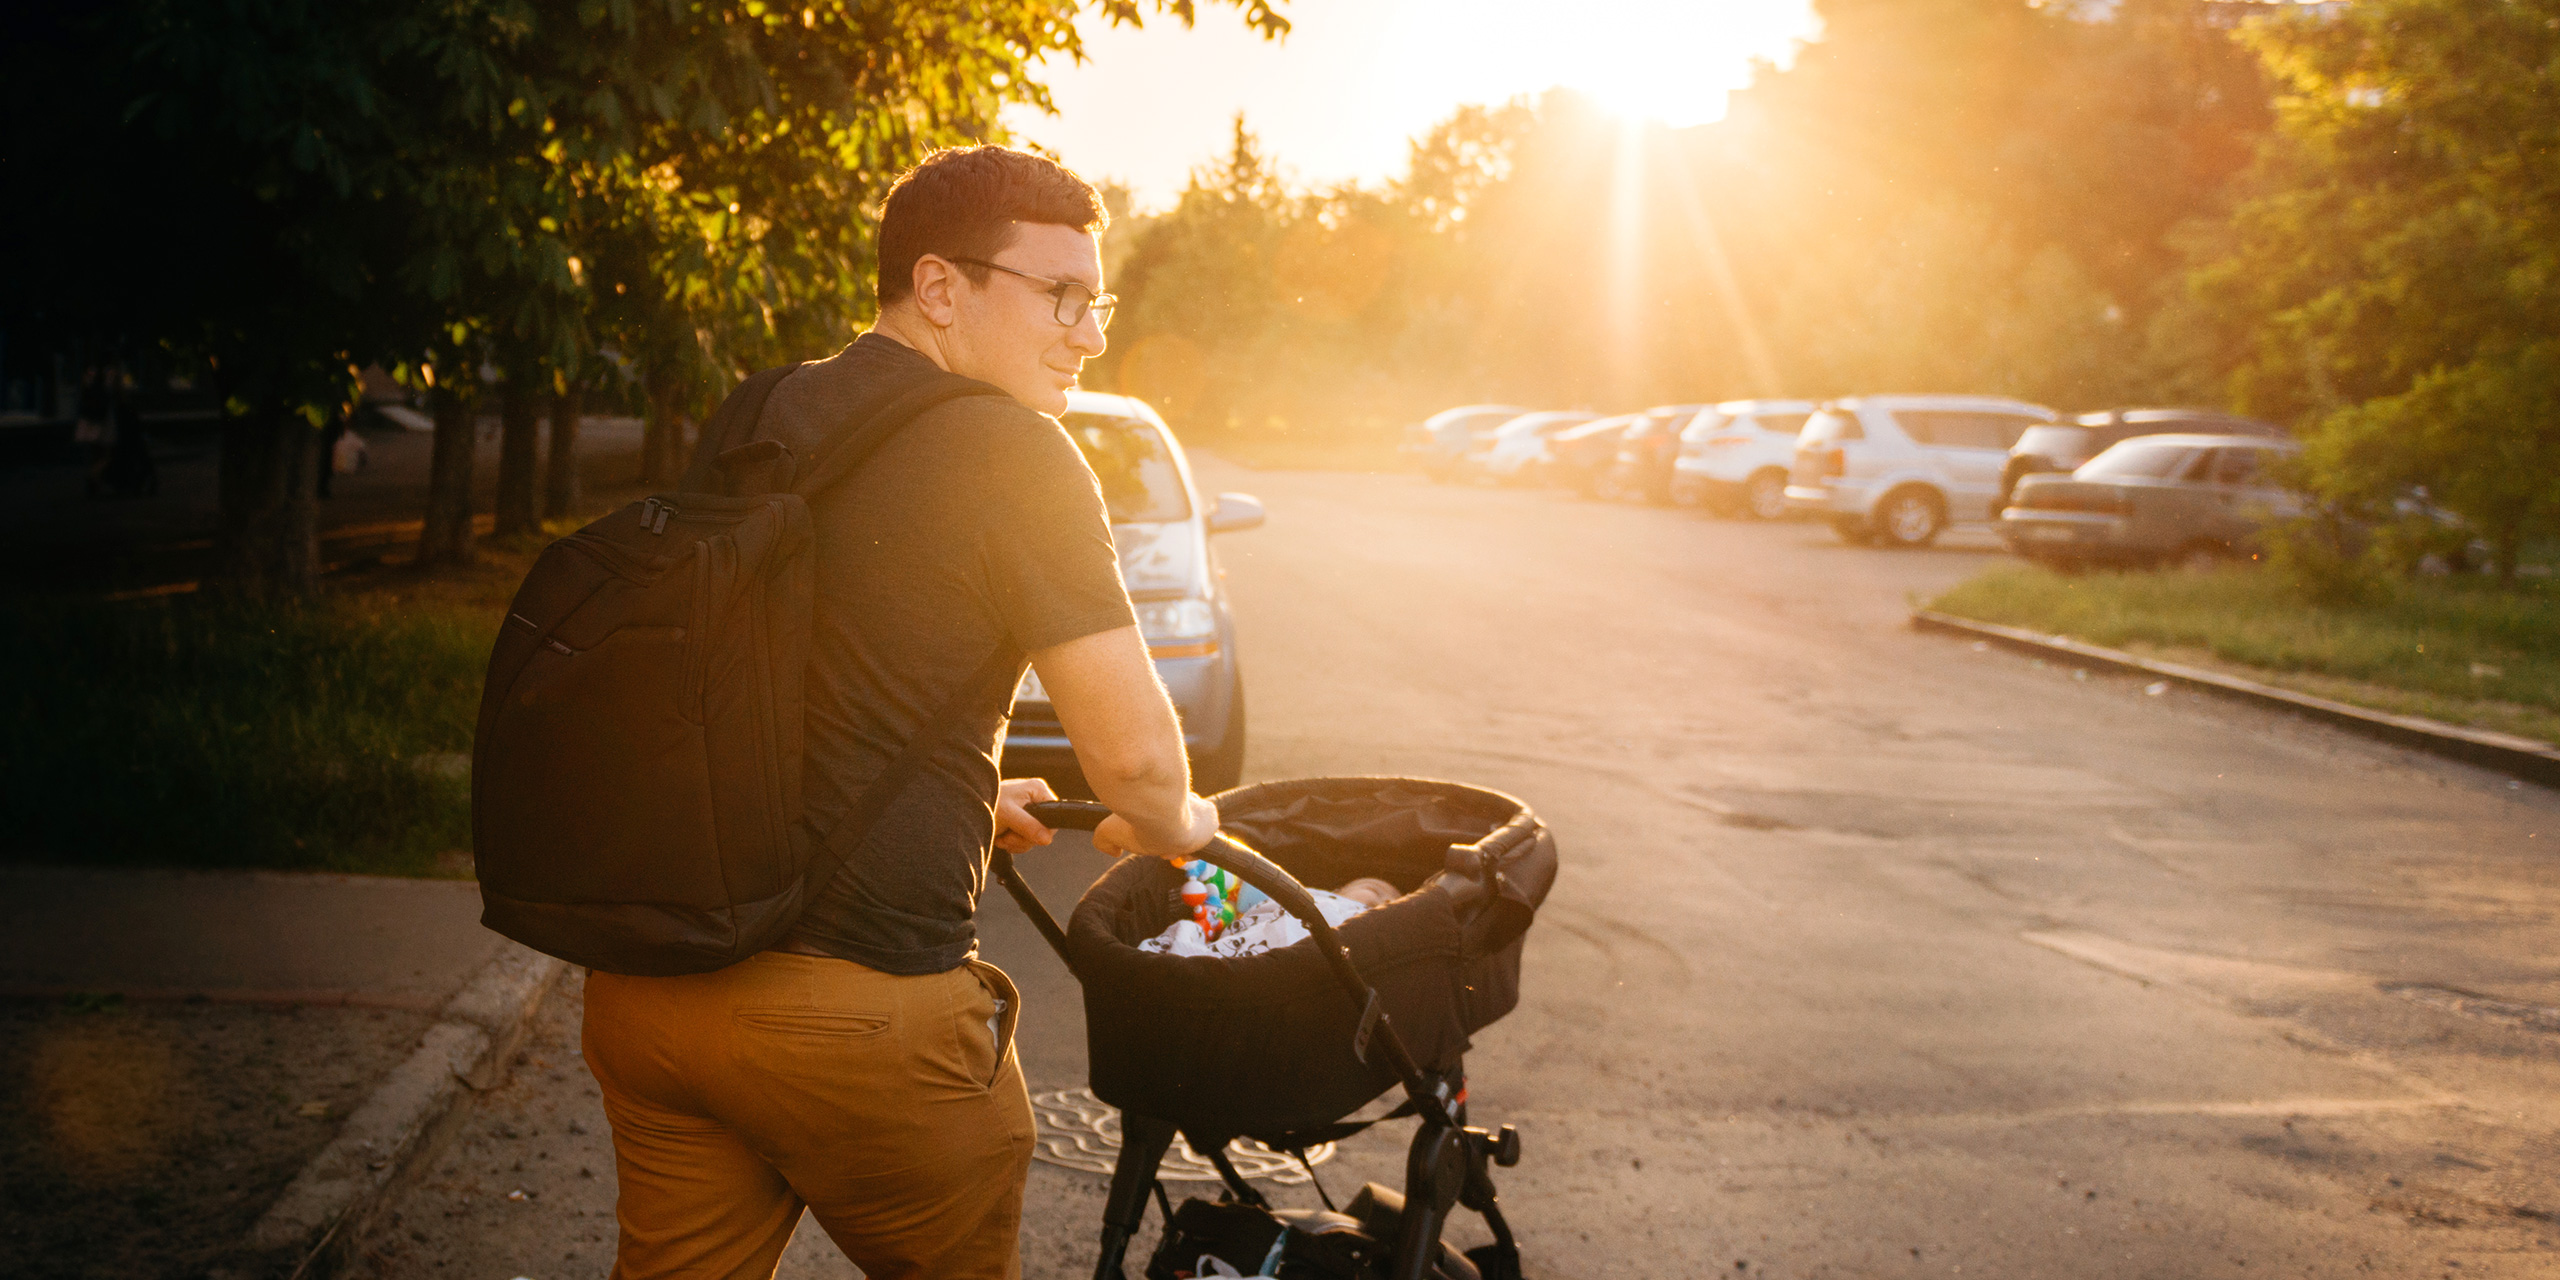 dad baby bassinet stroller backpack ; Courtesy of Troyan/Shutterstock